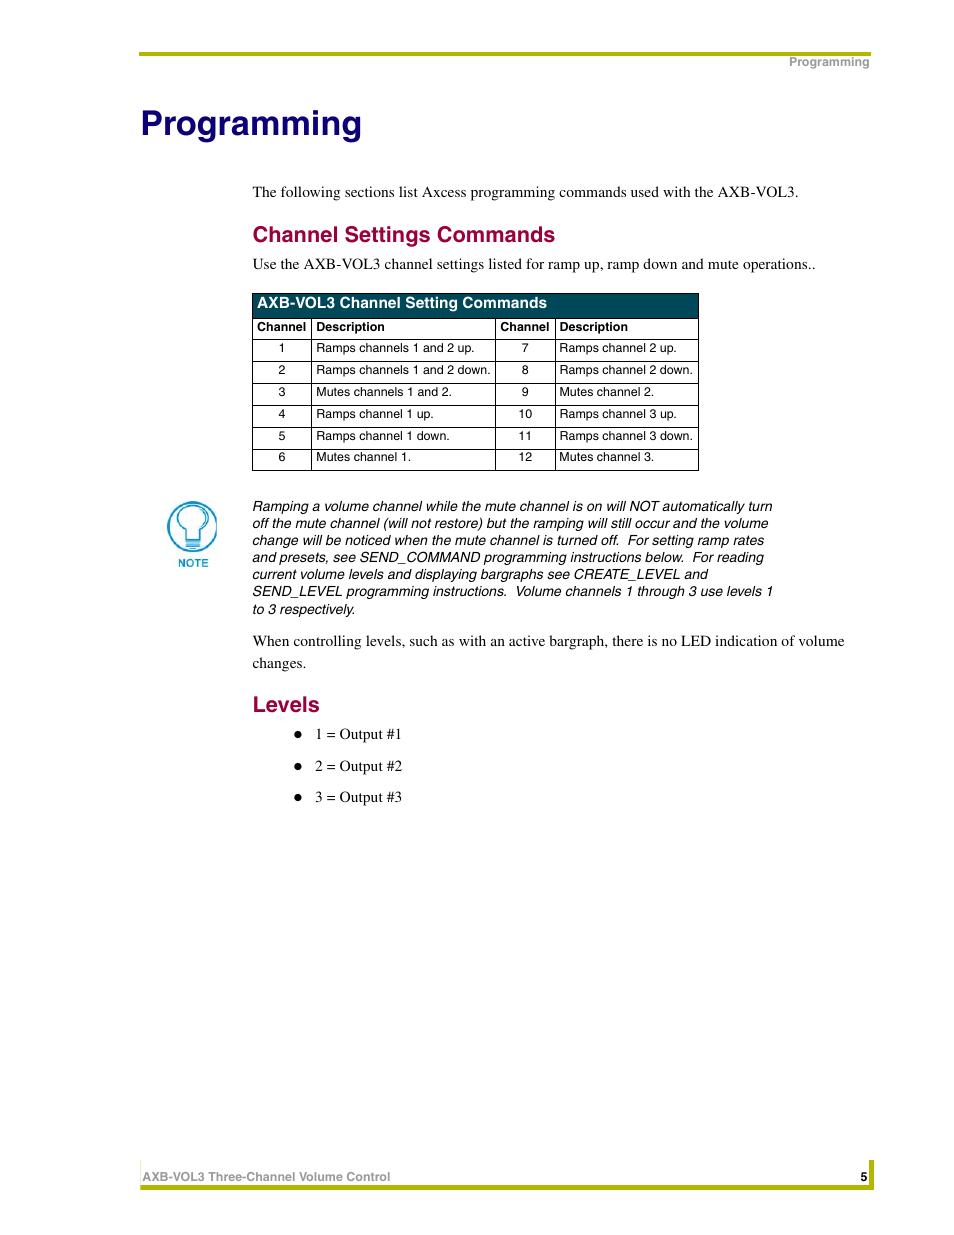 Programming, Channel settings commands, Levels   AMX AXB-VOL3 User